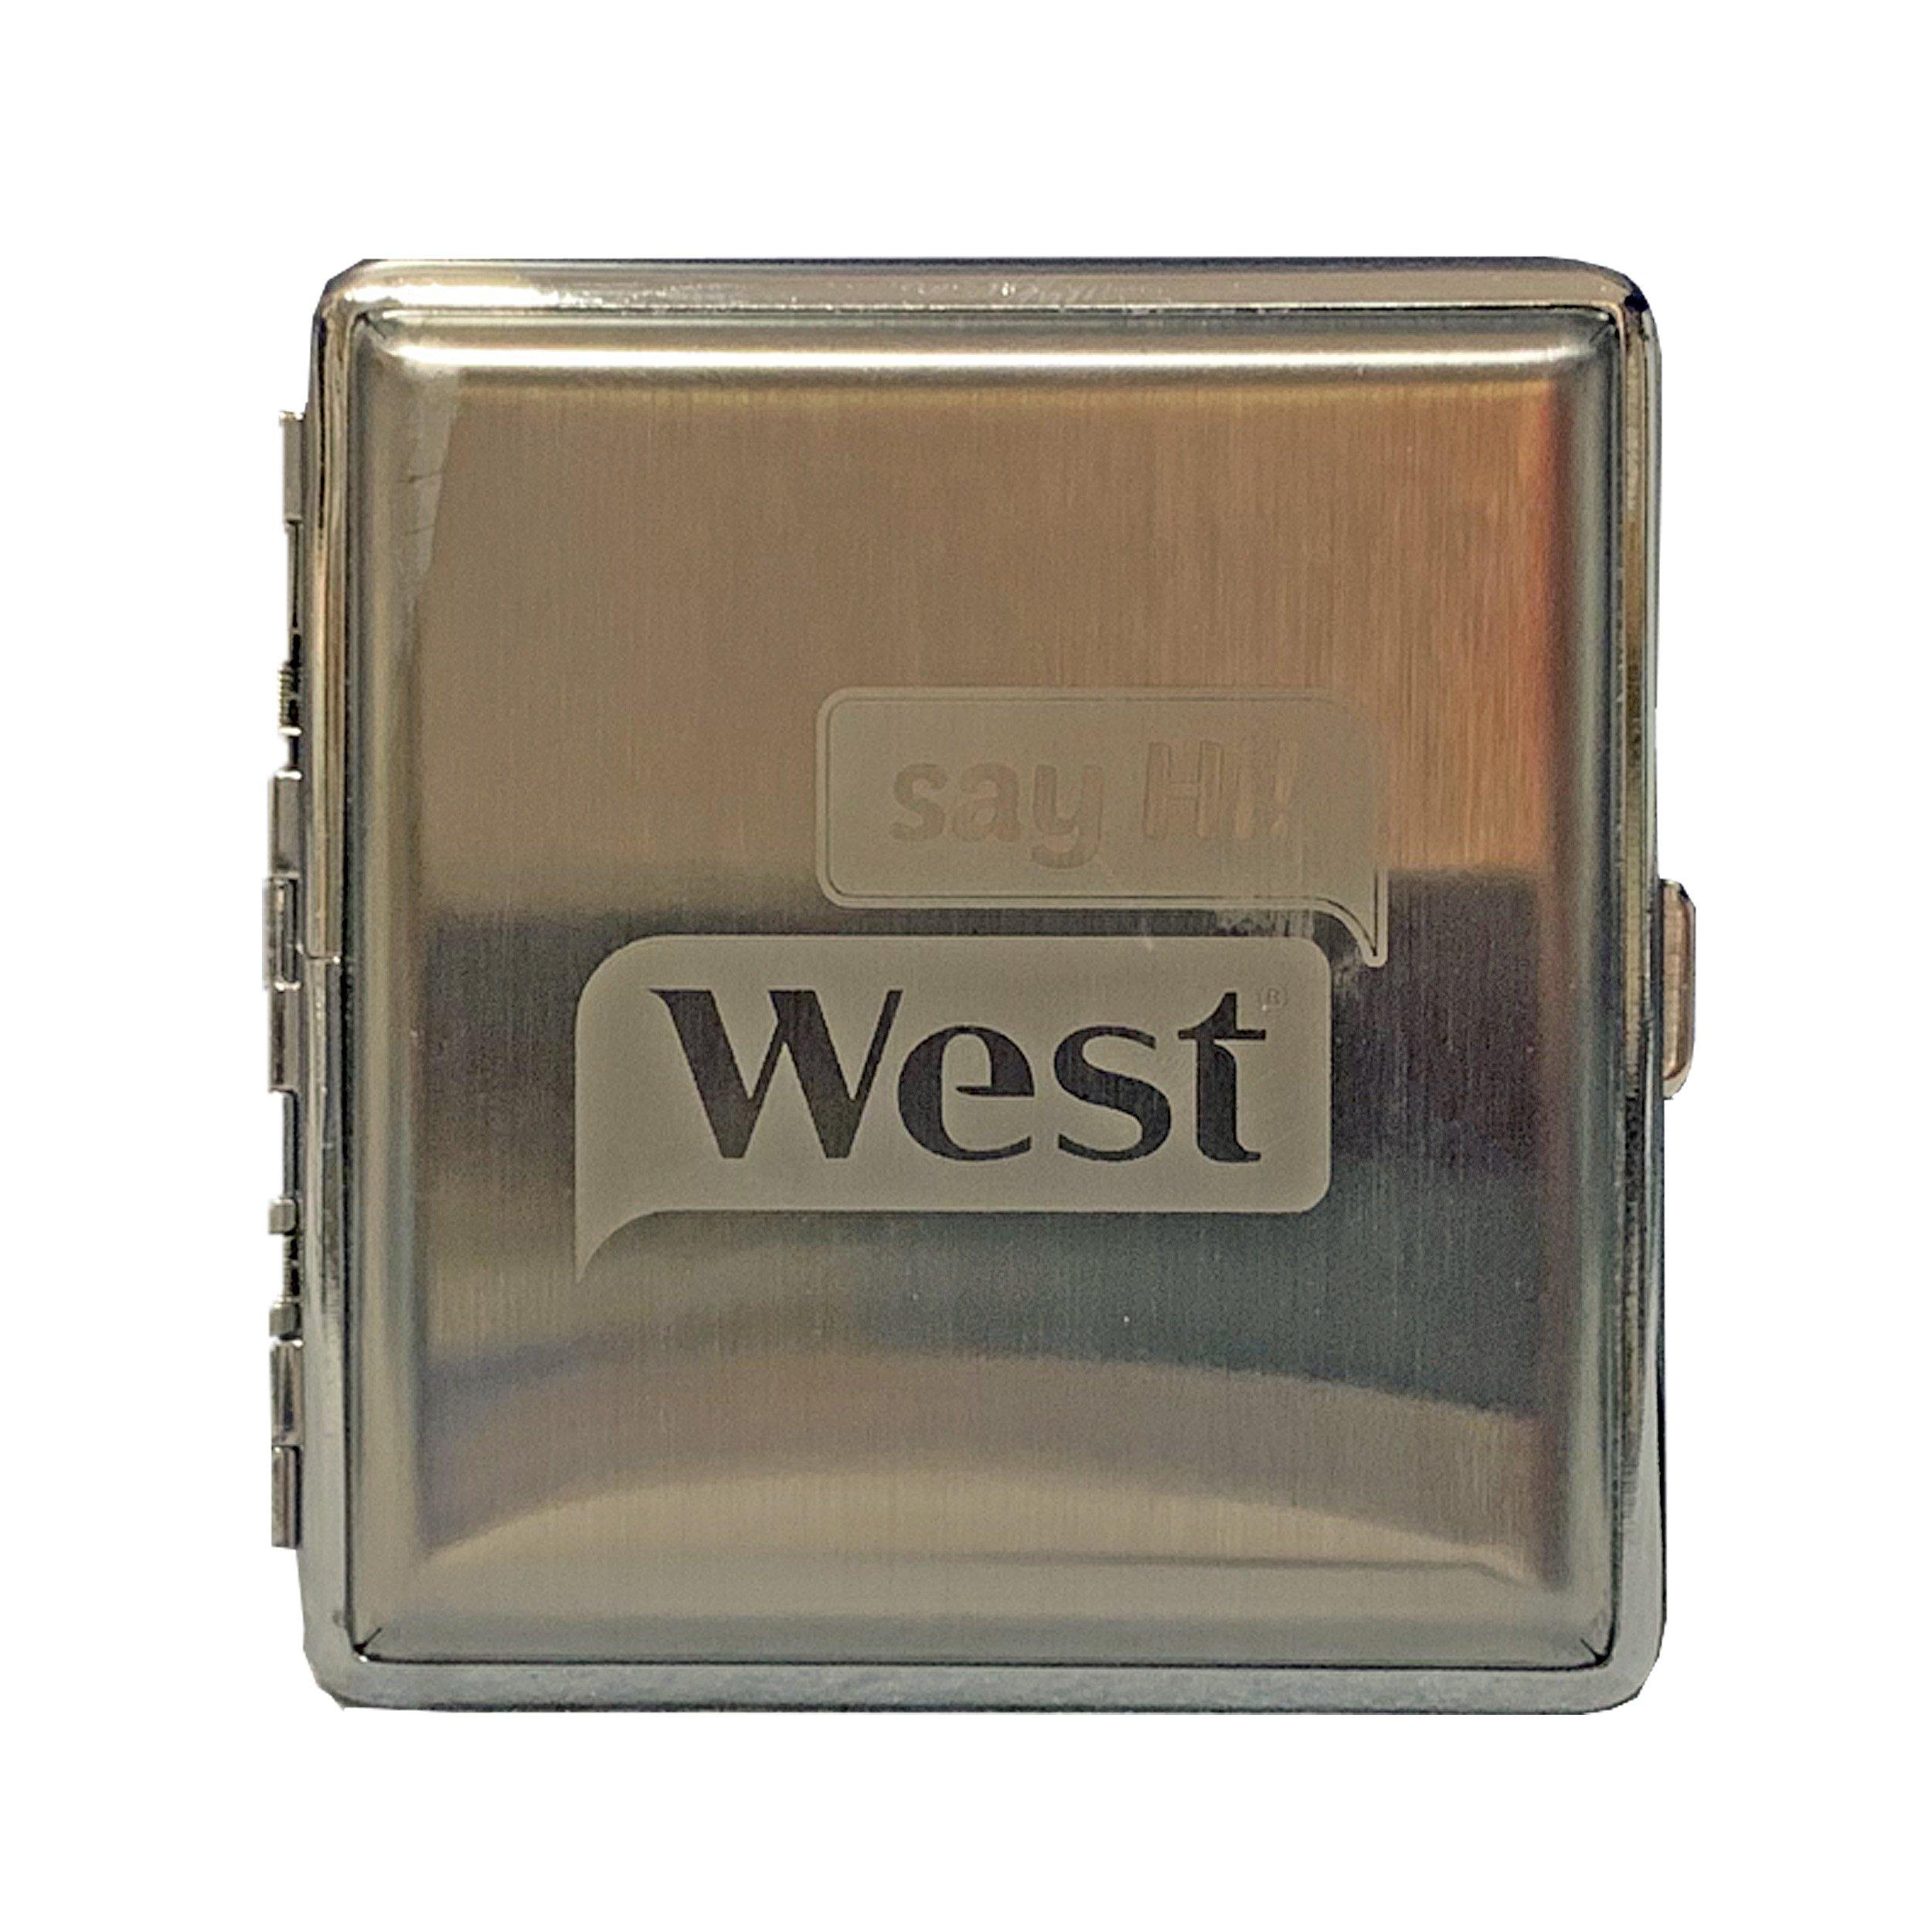 West oder JPS Zigarettenetui aus Metall